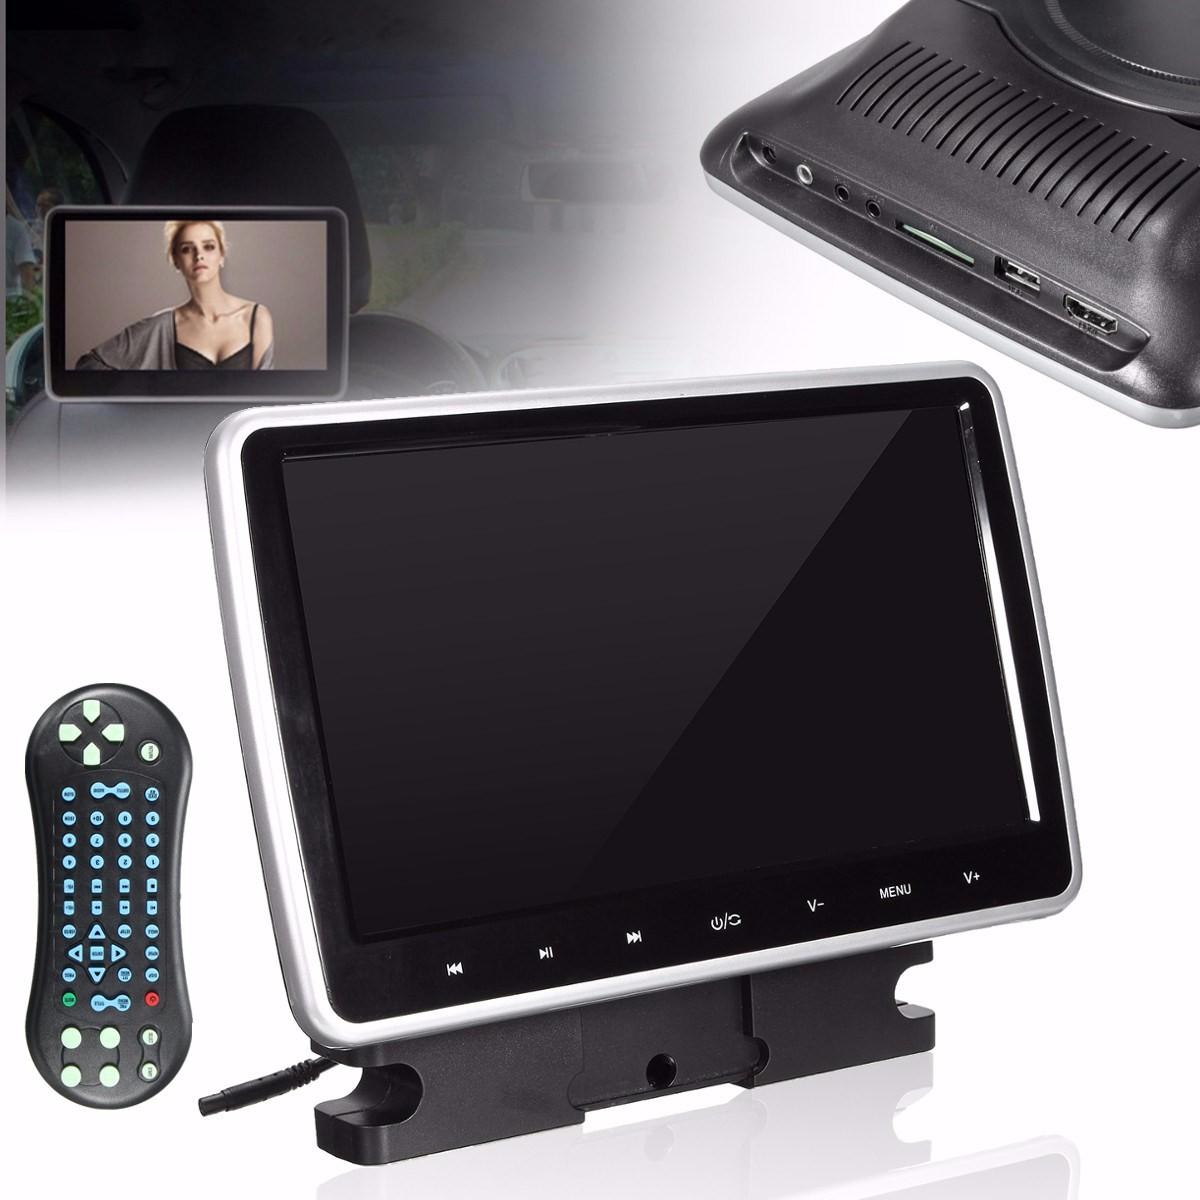 10 zoll auto kopfst tze monitor tragbar dvd player hd lcd. Black Bedroom Furniture Sets. Home Design Ideas